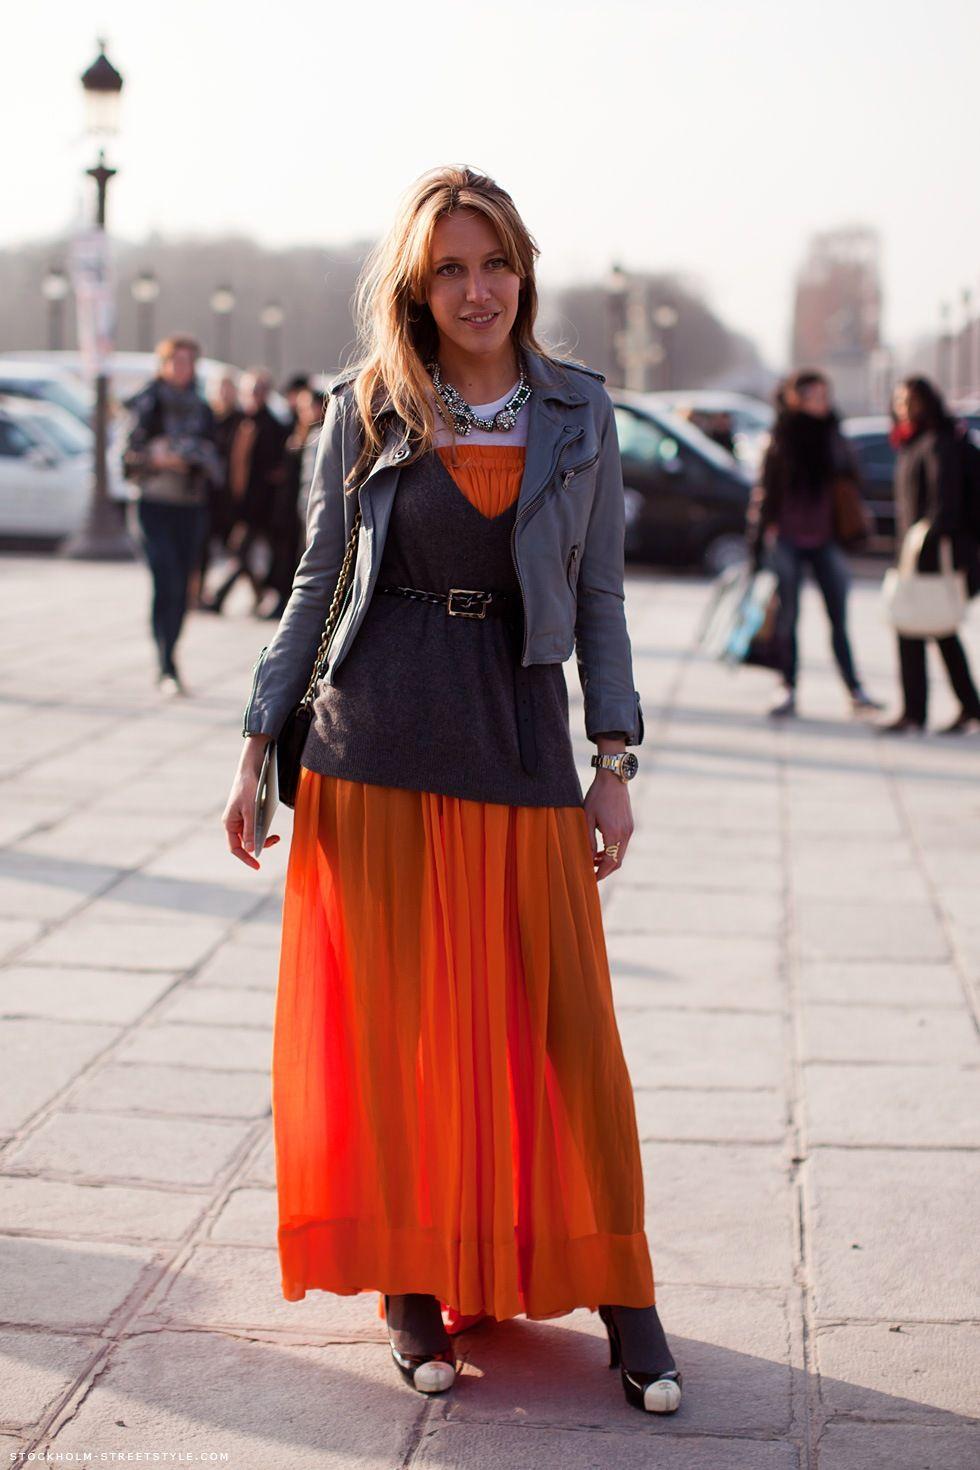 Carolines Mode Stockholmstreetstyle Fashion Sweater Over Dress Maxi Skirt Dress [ 1470 x 980 Pixel ]